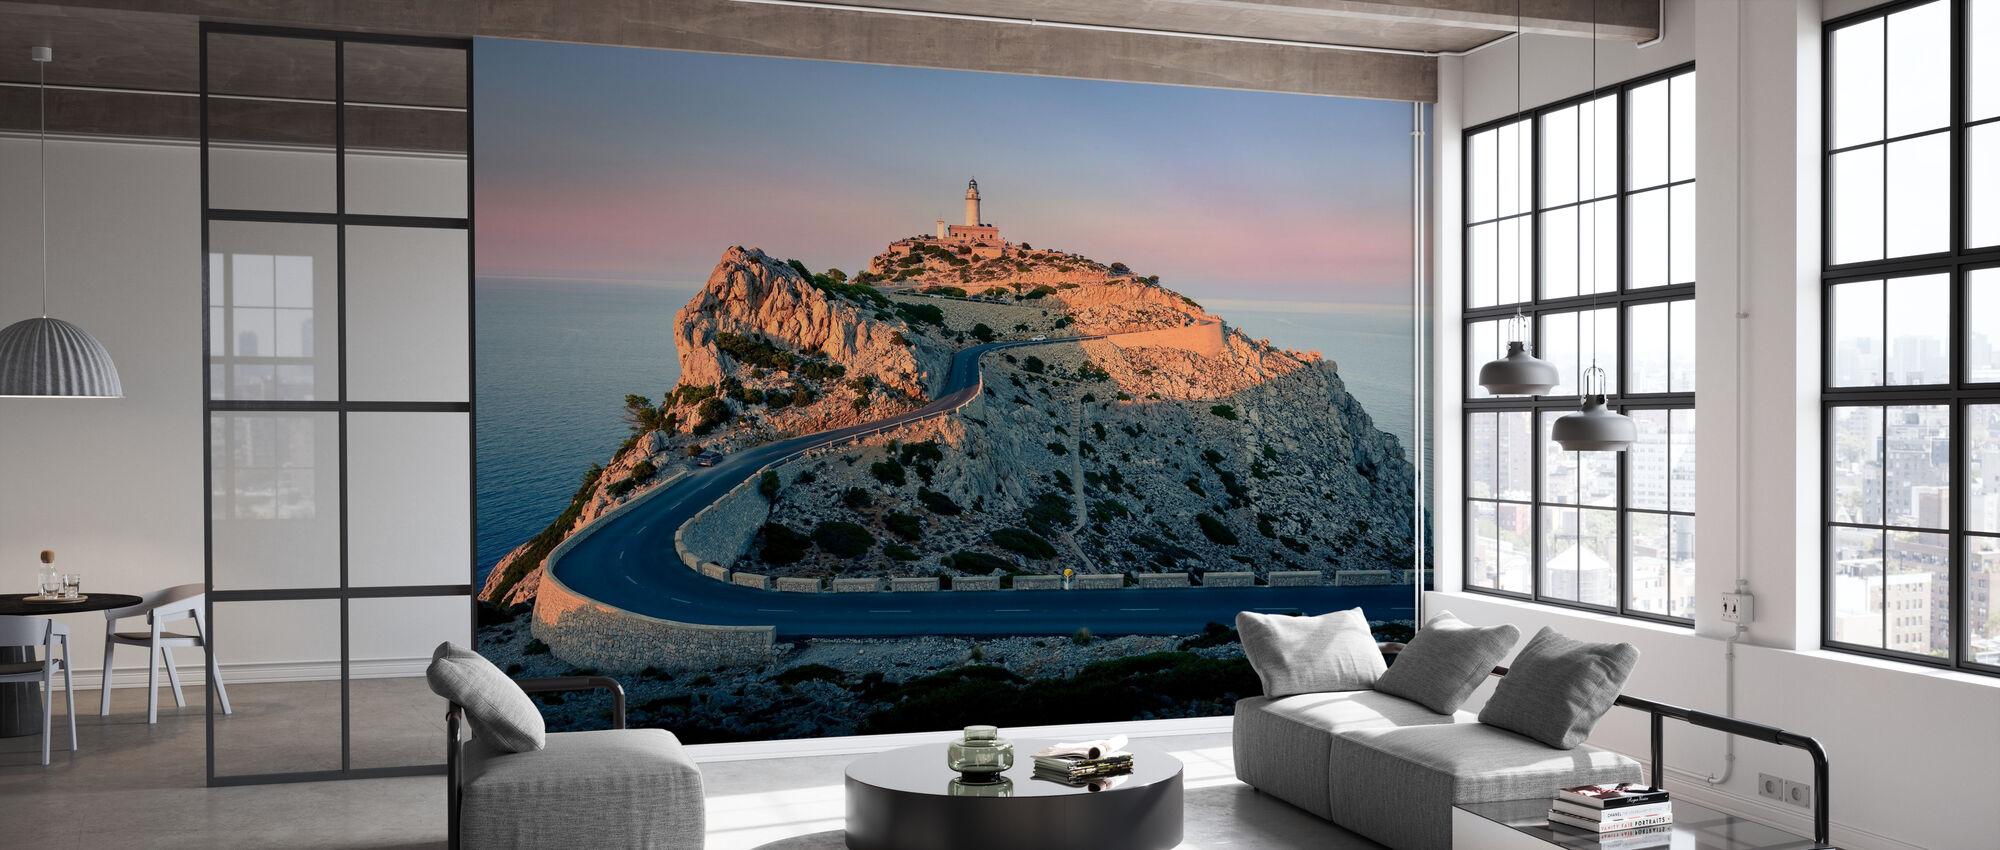 Lighthouse at Cap Formentor - Mallorca - Wallpaper - Office